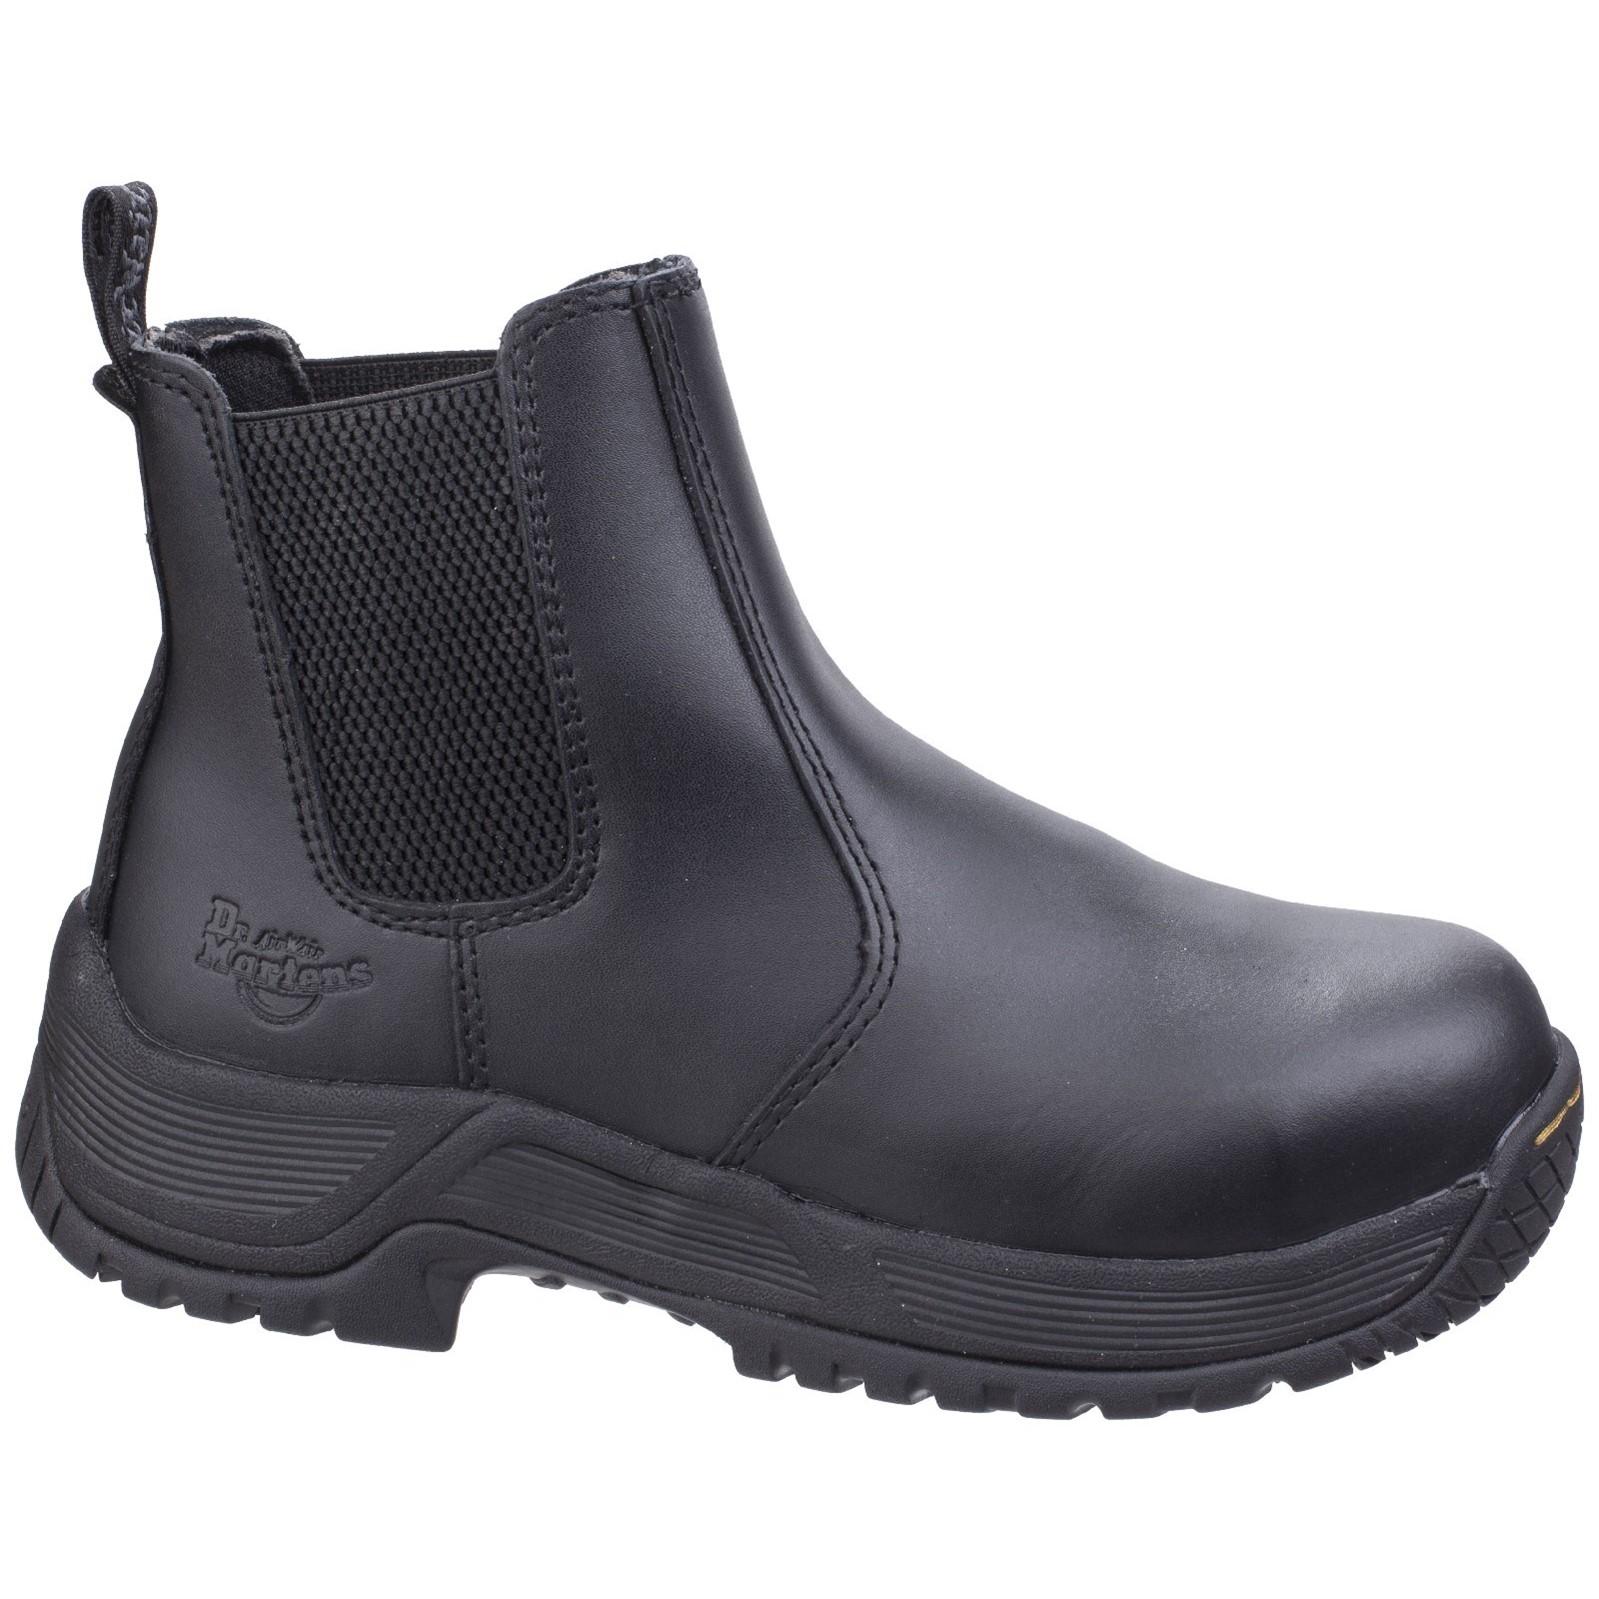 Dr Martens DM Docs Gunaldo ST Lightweight Steel Toe Cap Leather Safety Shoes PPE